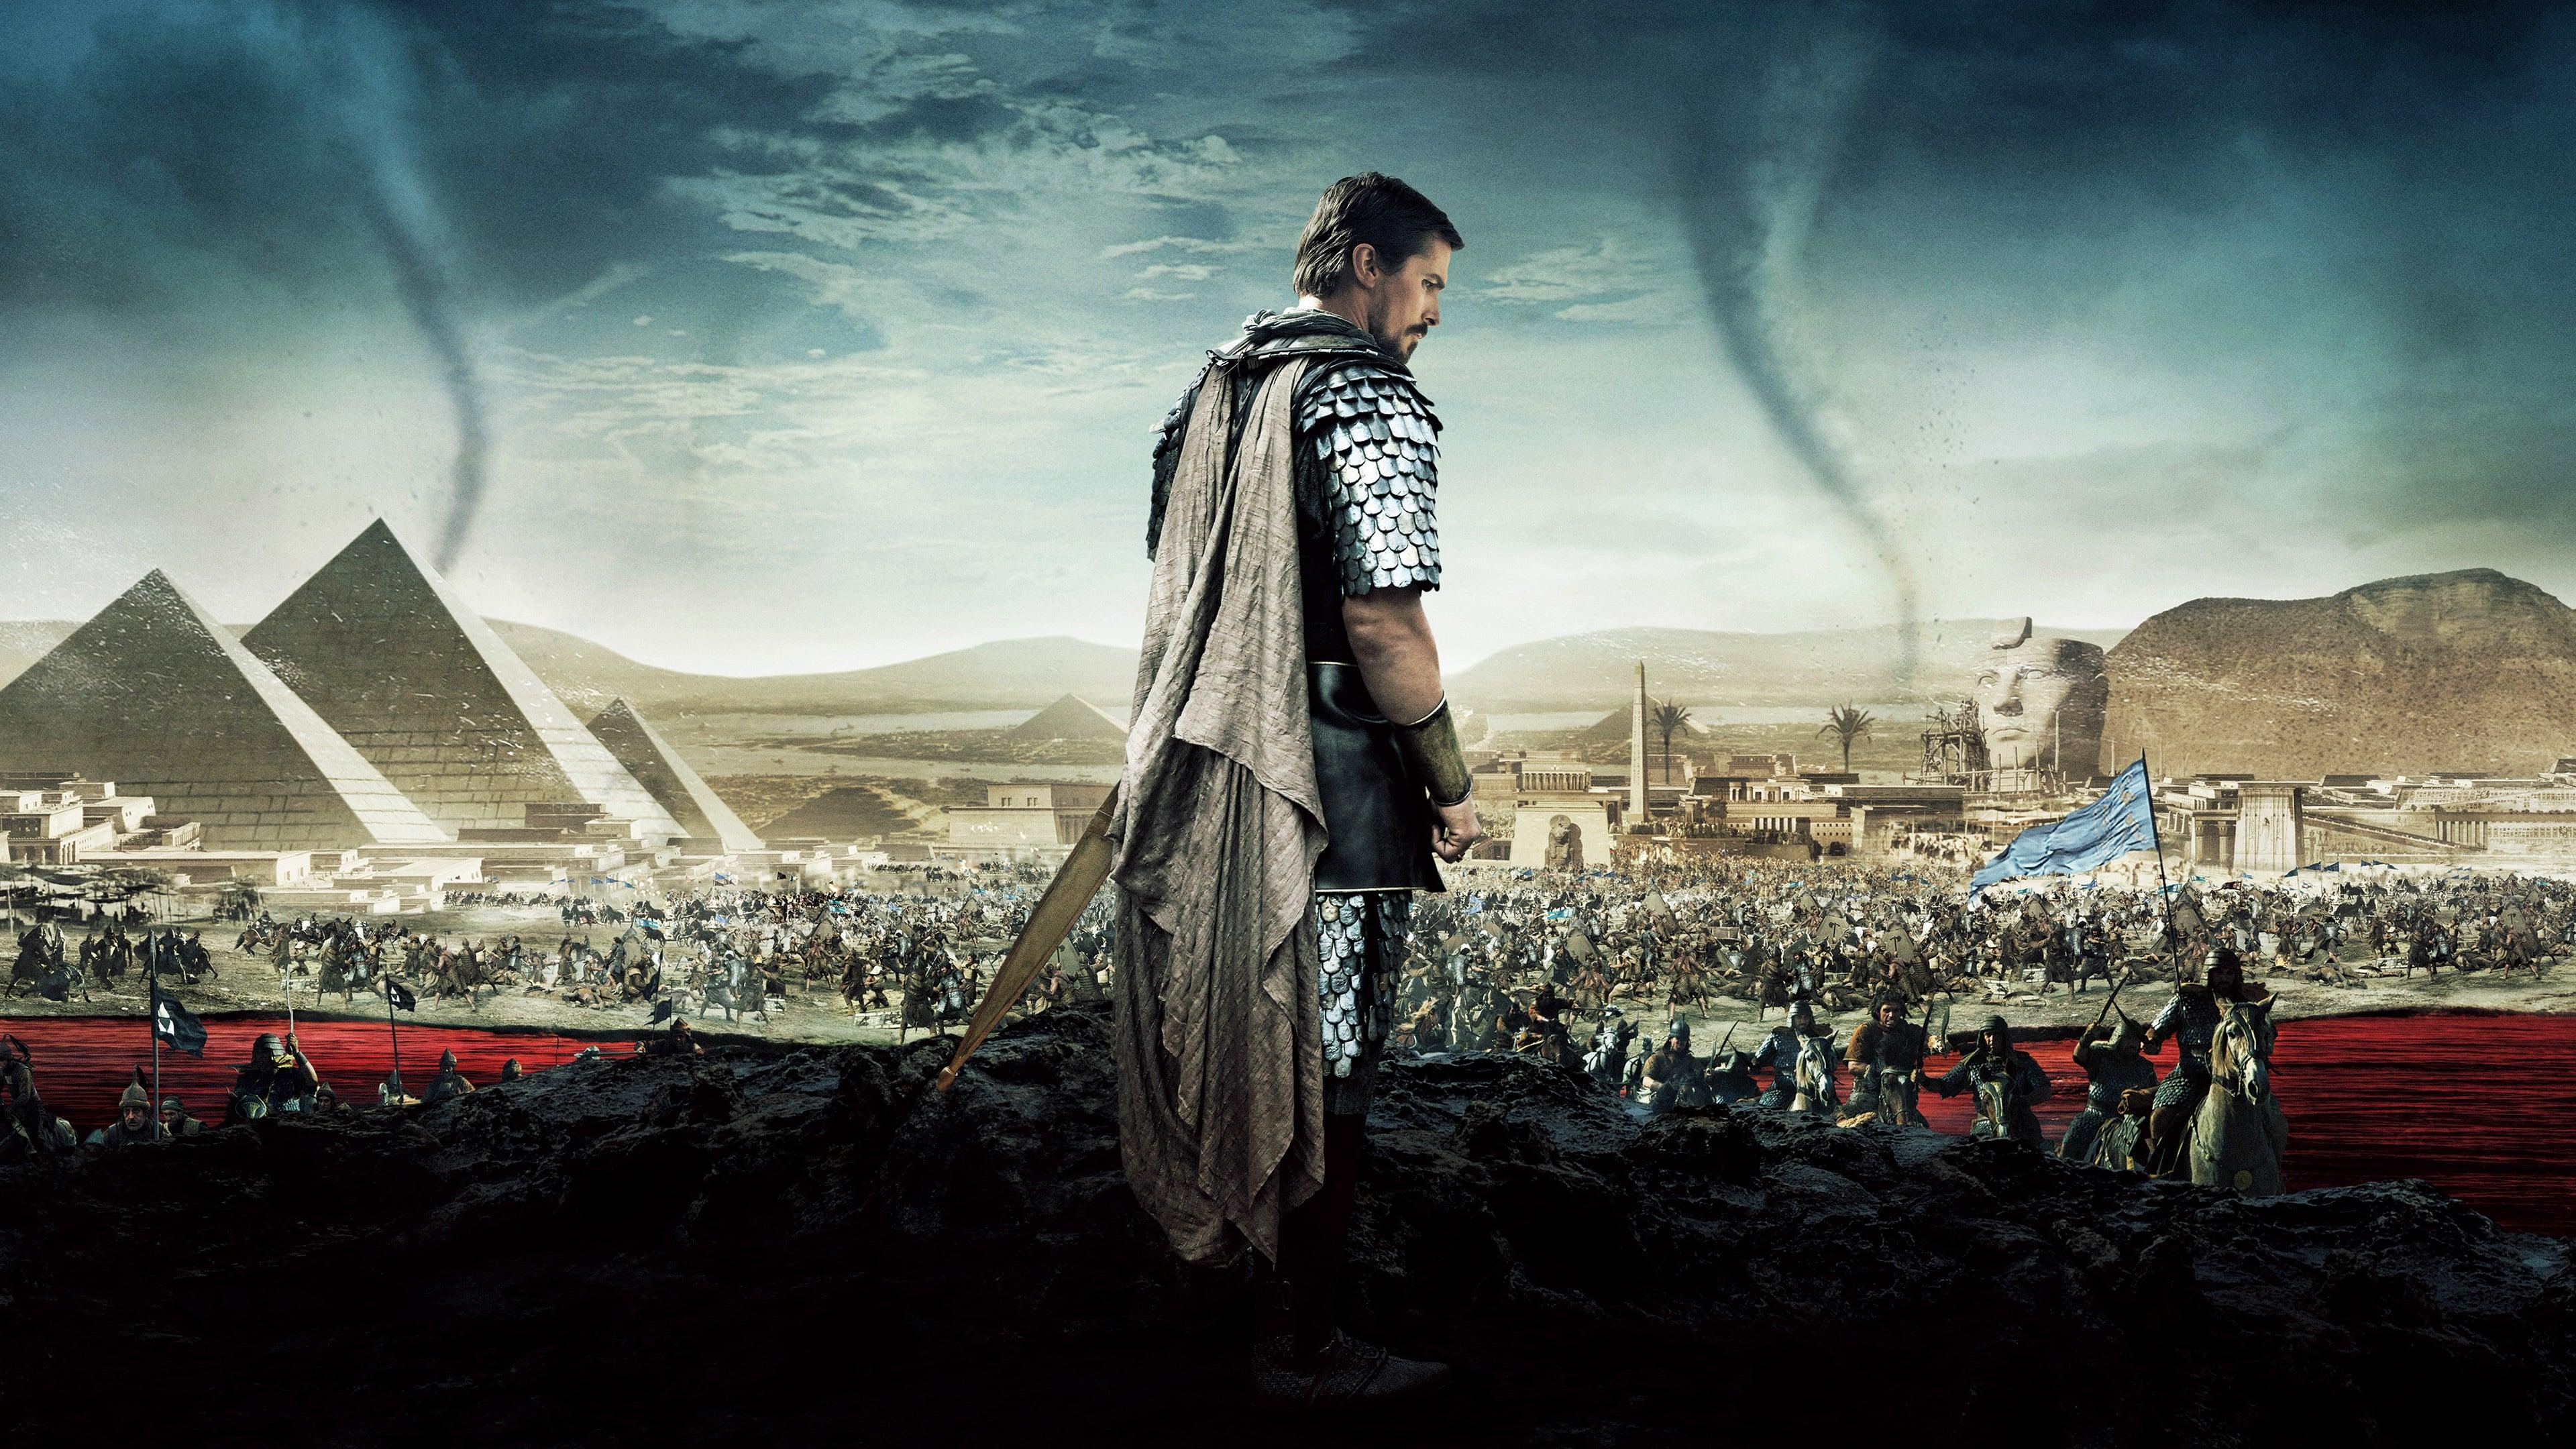 Filmszene aus Exodus - Götter und Könige